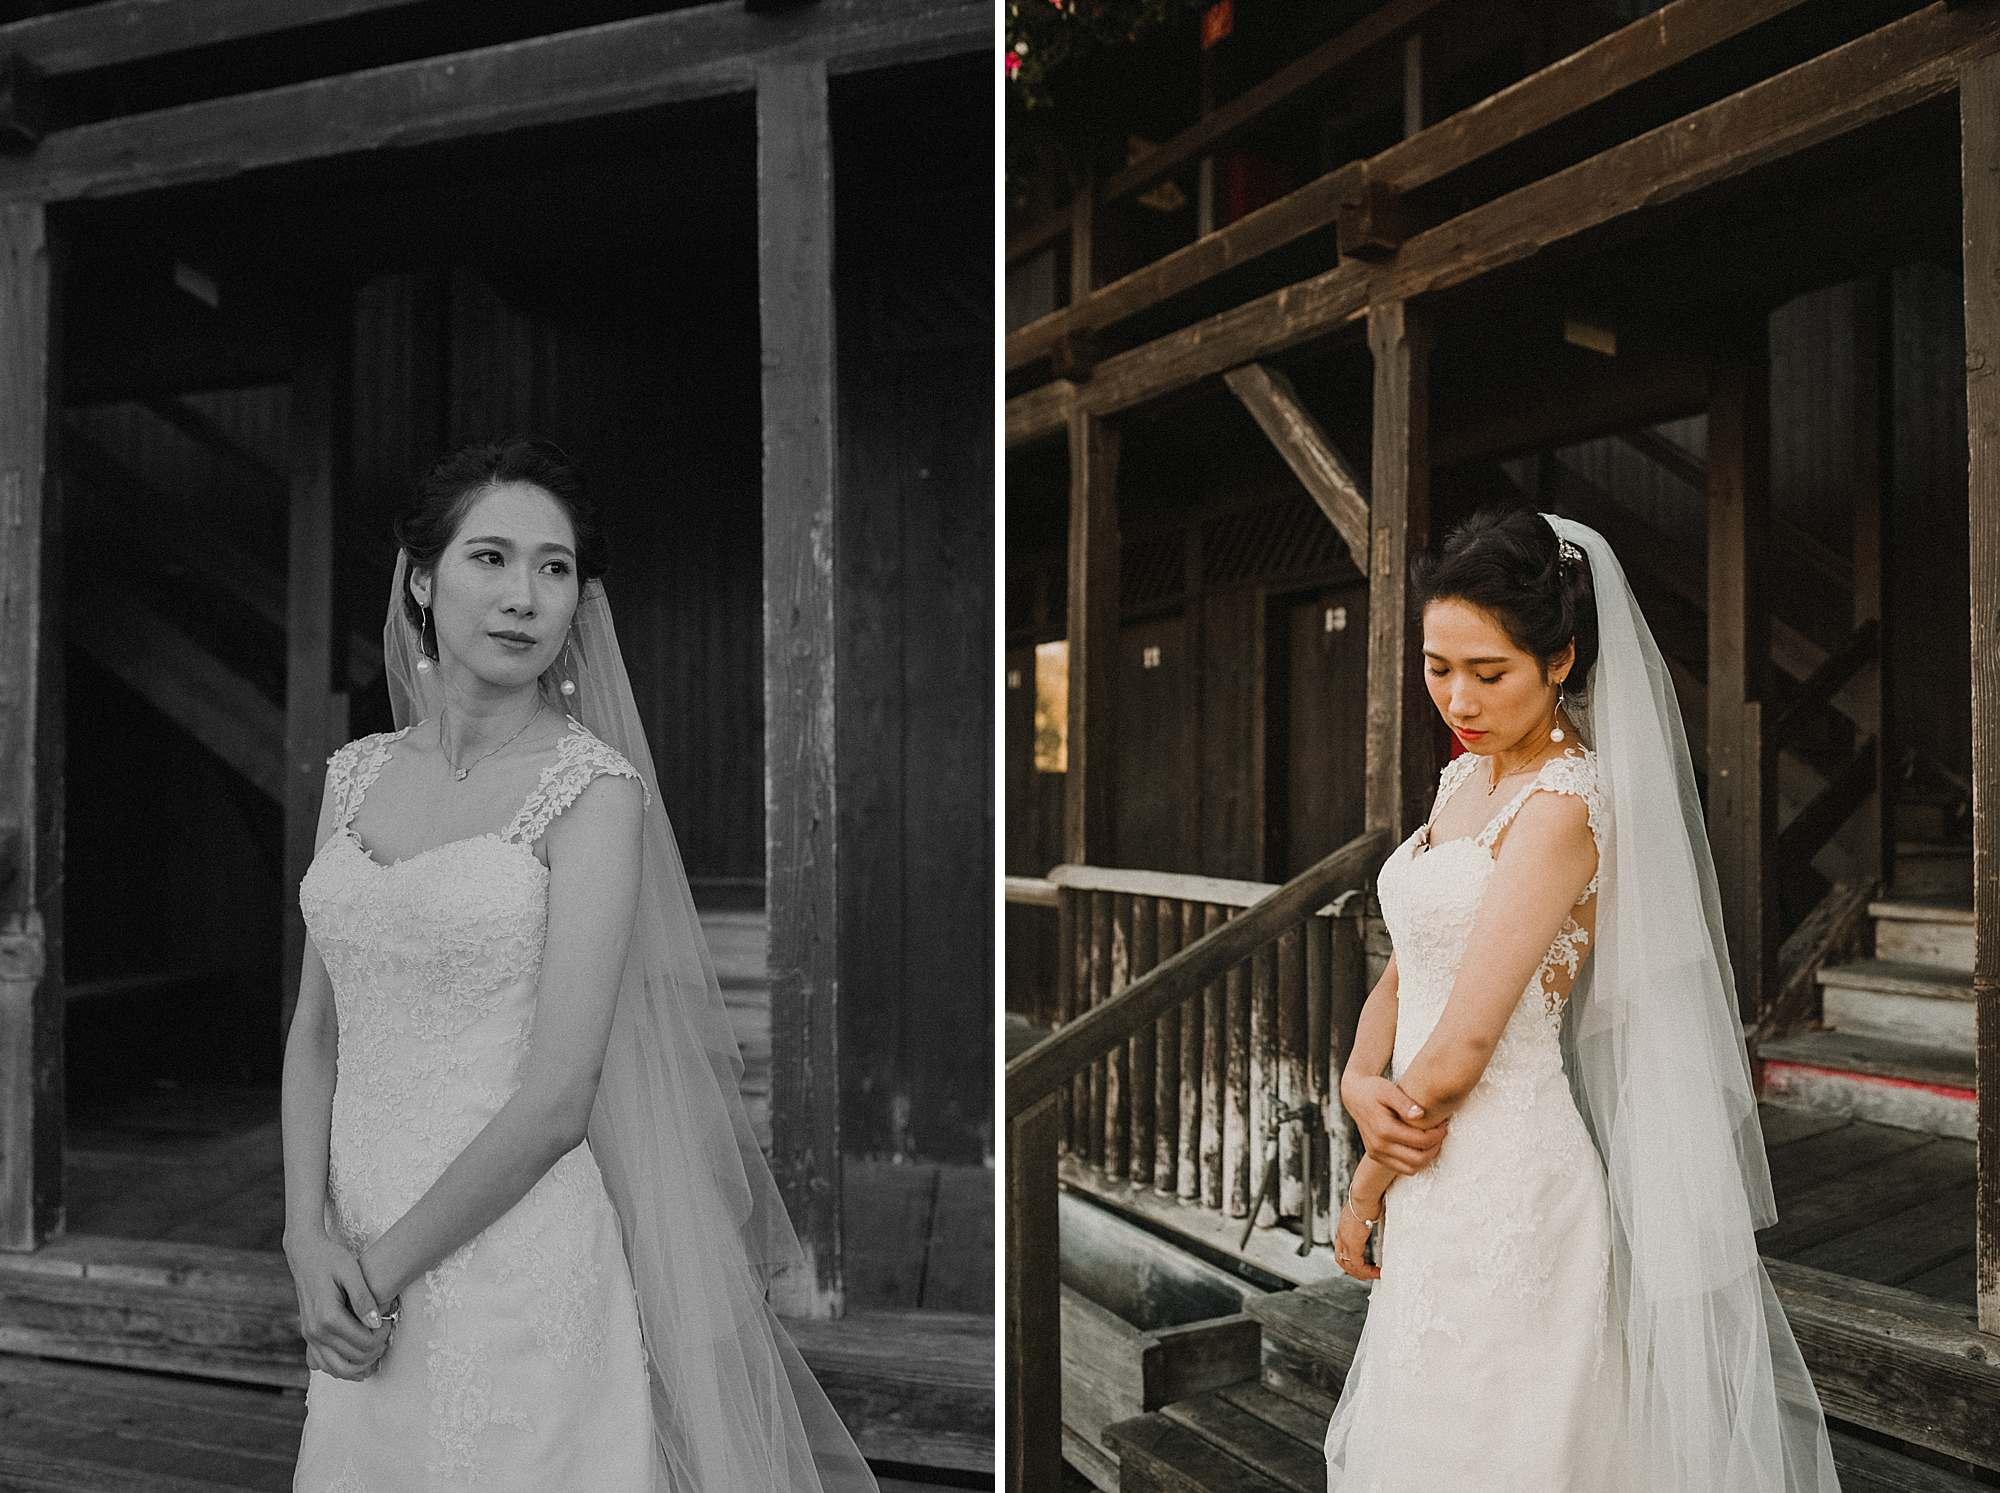 kitzbuehel wedding photographer_0057.jpg